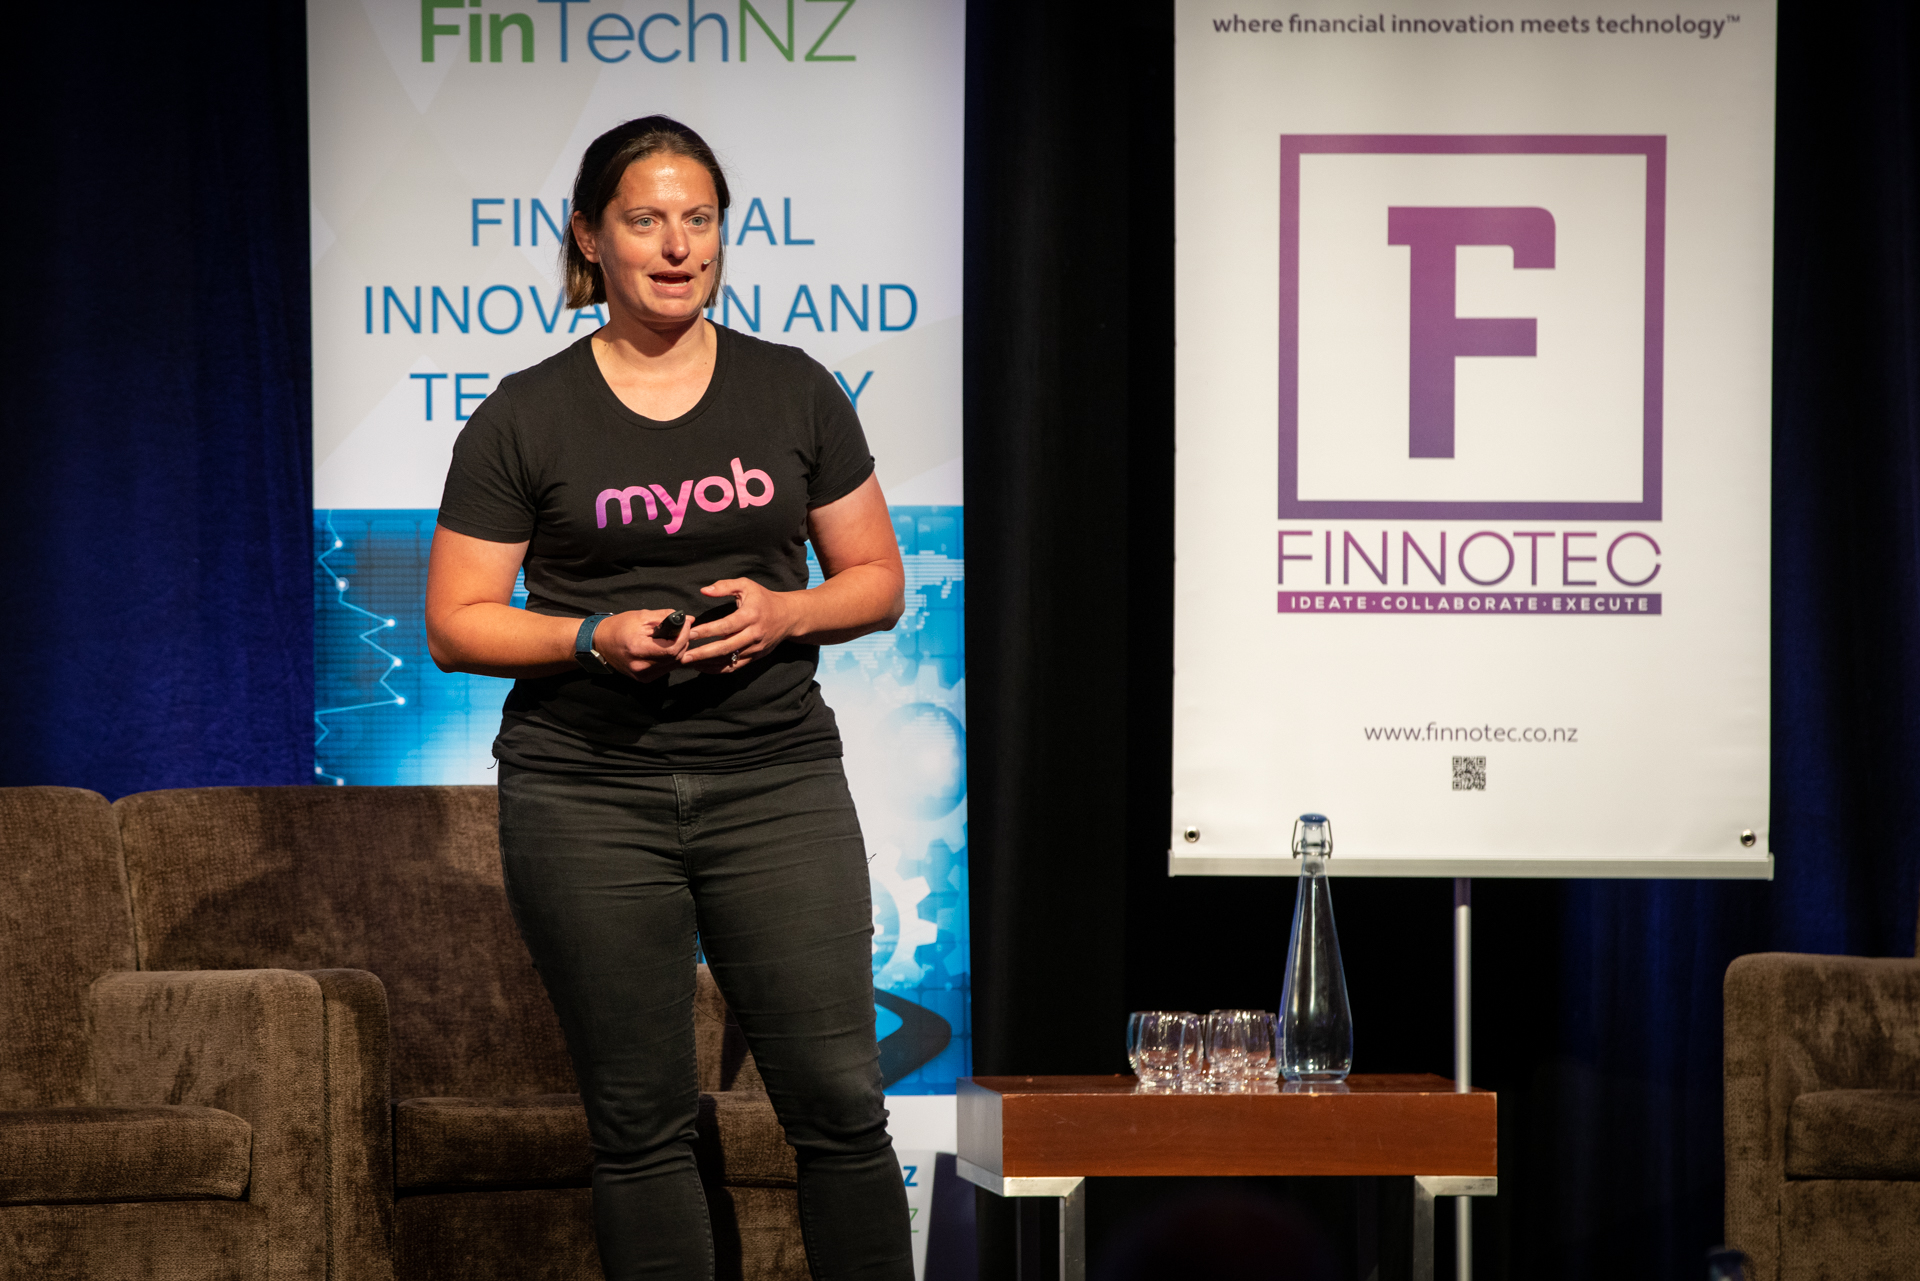 Krissy Sadler-Bridge, Head of Marketing, MYOB